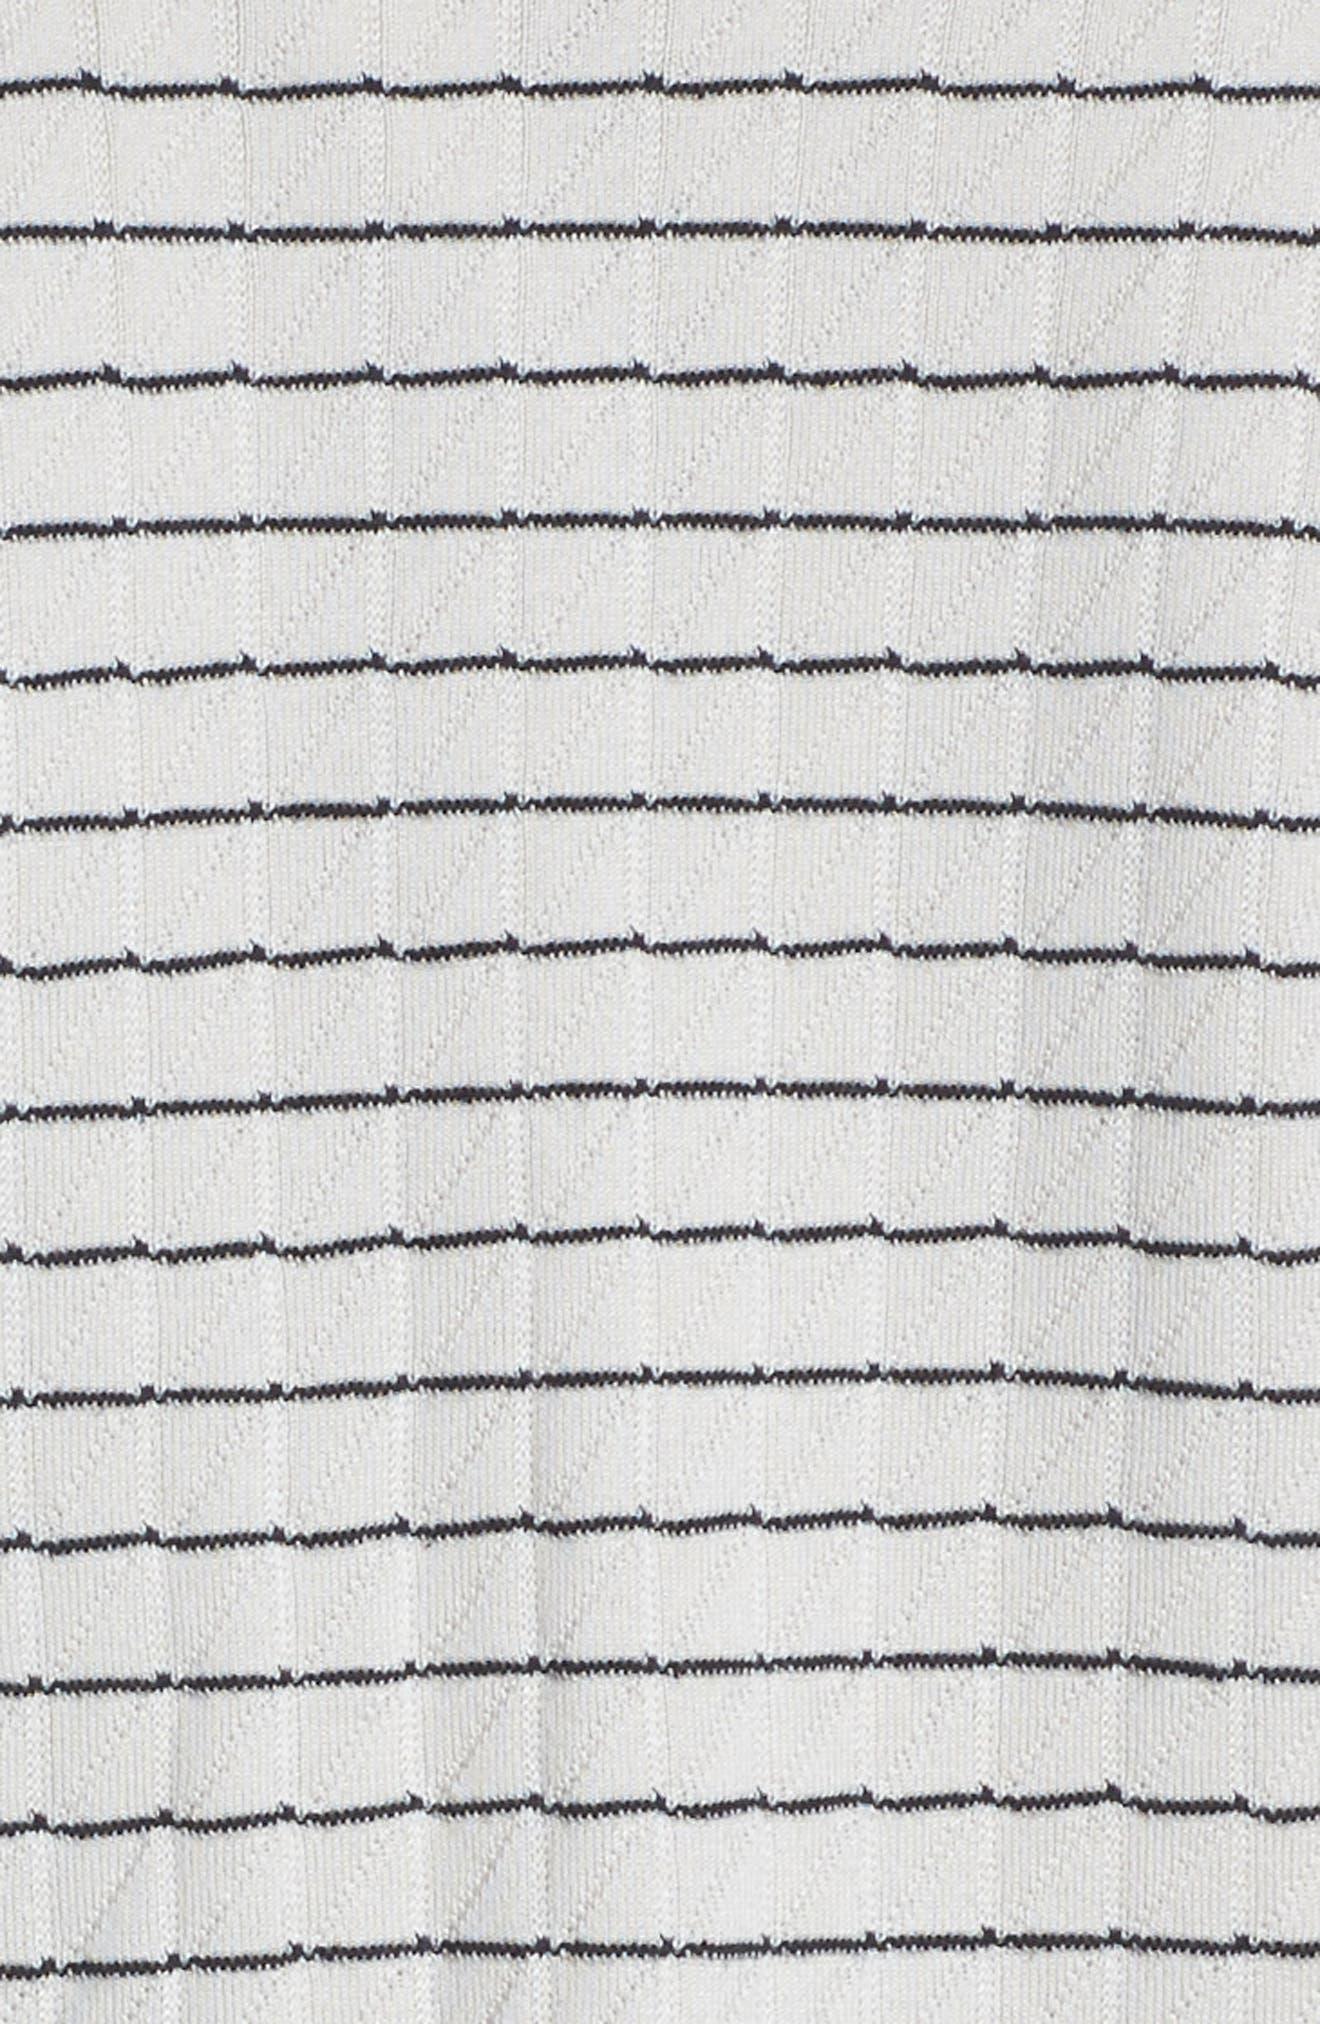 Layered Look Knit Jacket,                             Alternate thumbnail 6, color,                             278